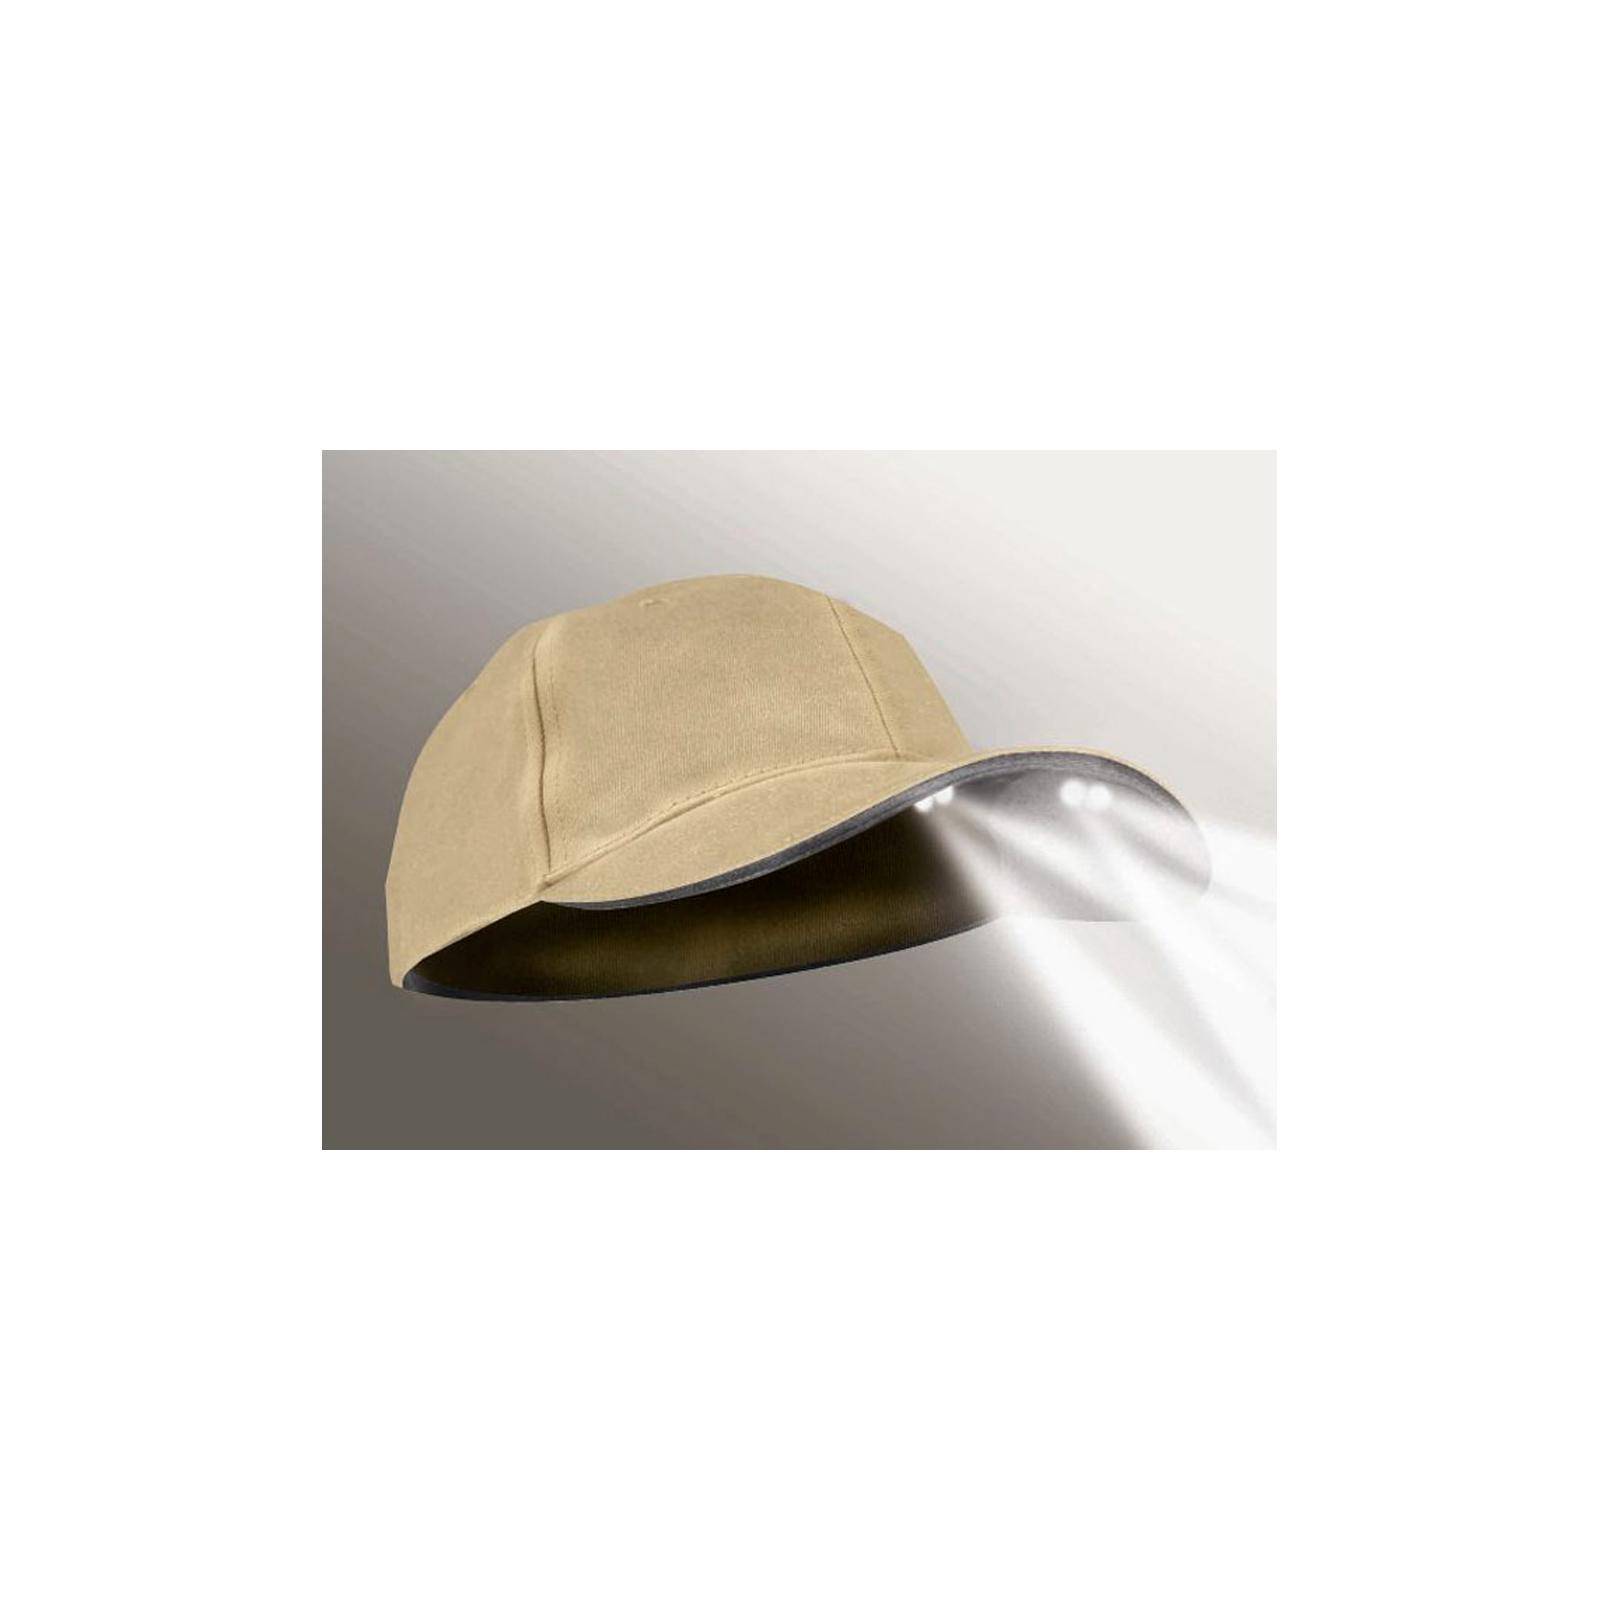 Powercap Stealth 2575 4 Led Khaki Tan Structured